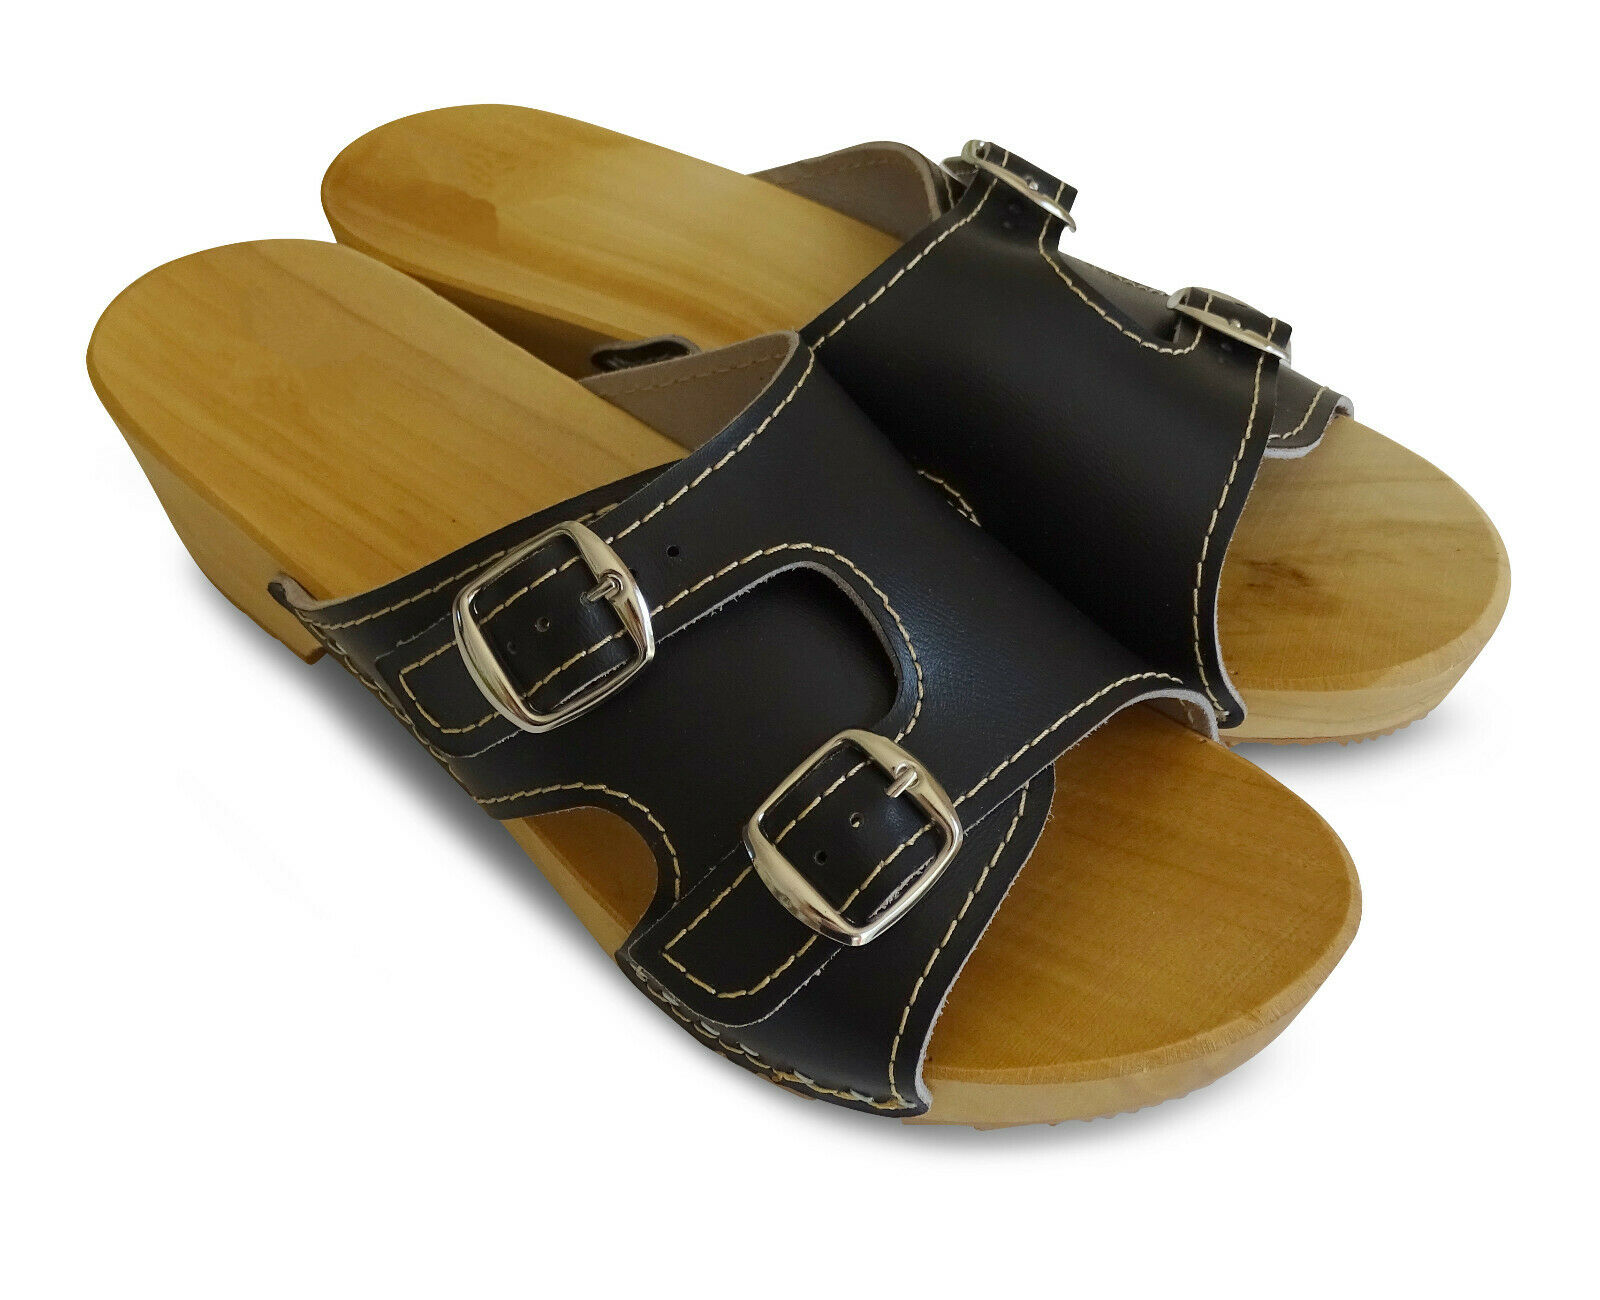 2 Holz Holzschuhe Damen Leder Pantoletten Clogs Sandalen Mit OPk0w8Xn